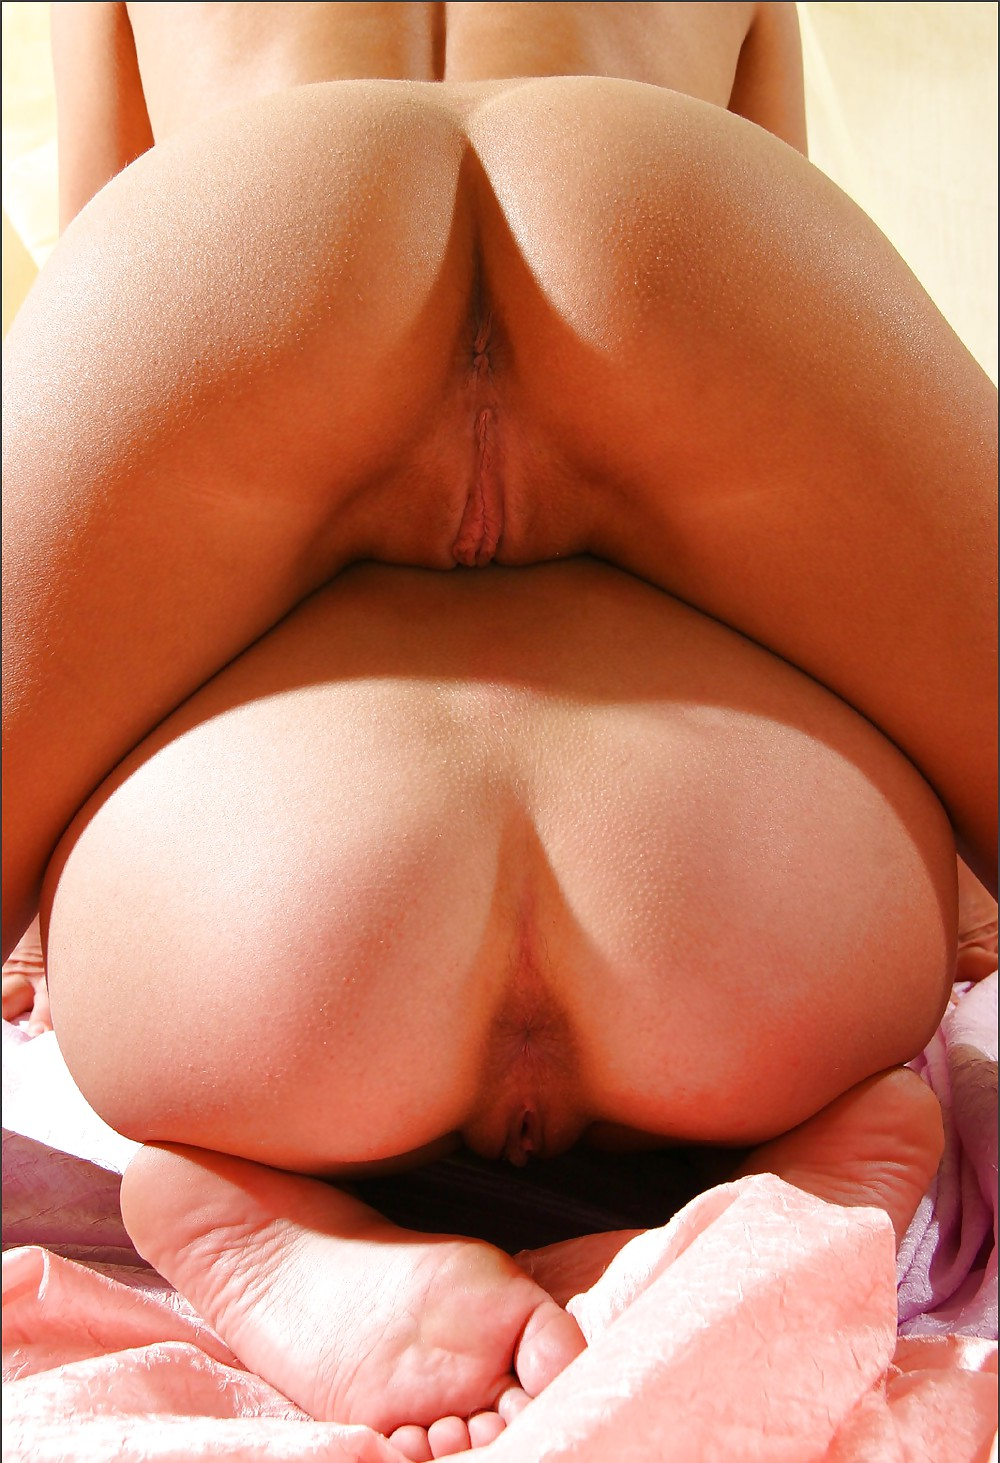 videos de como masturbarse una mujer Ass, Asshole, Balls, Boy, Bsfb, Cock, Feet, Femboi, Soles, Toes, Twink